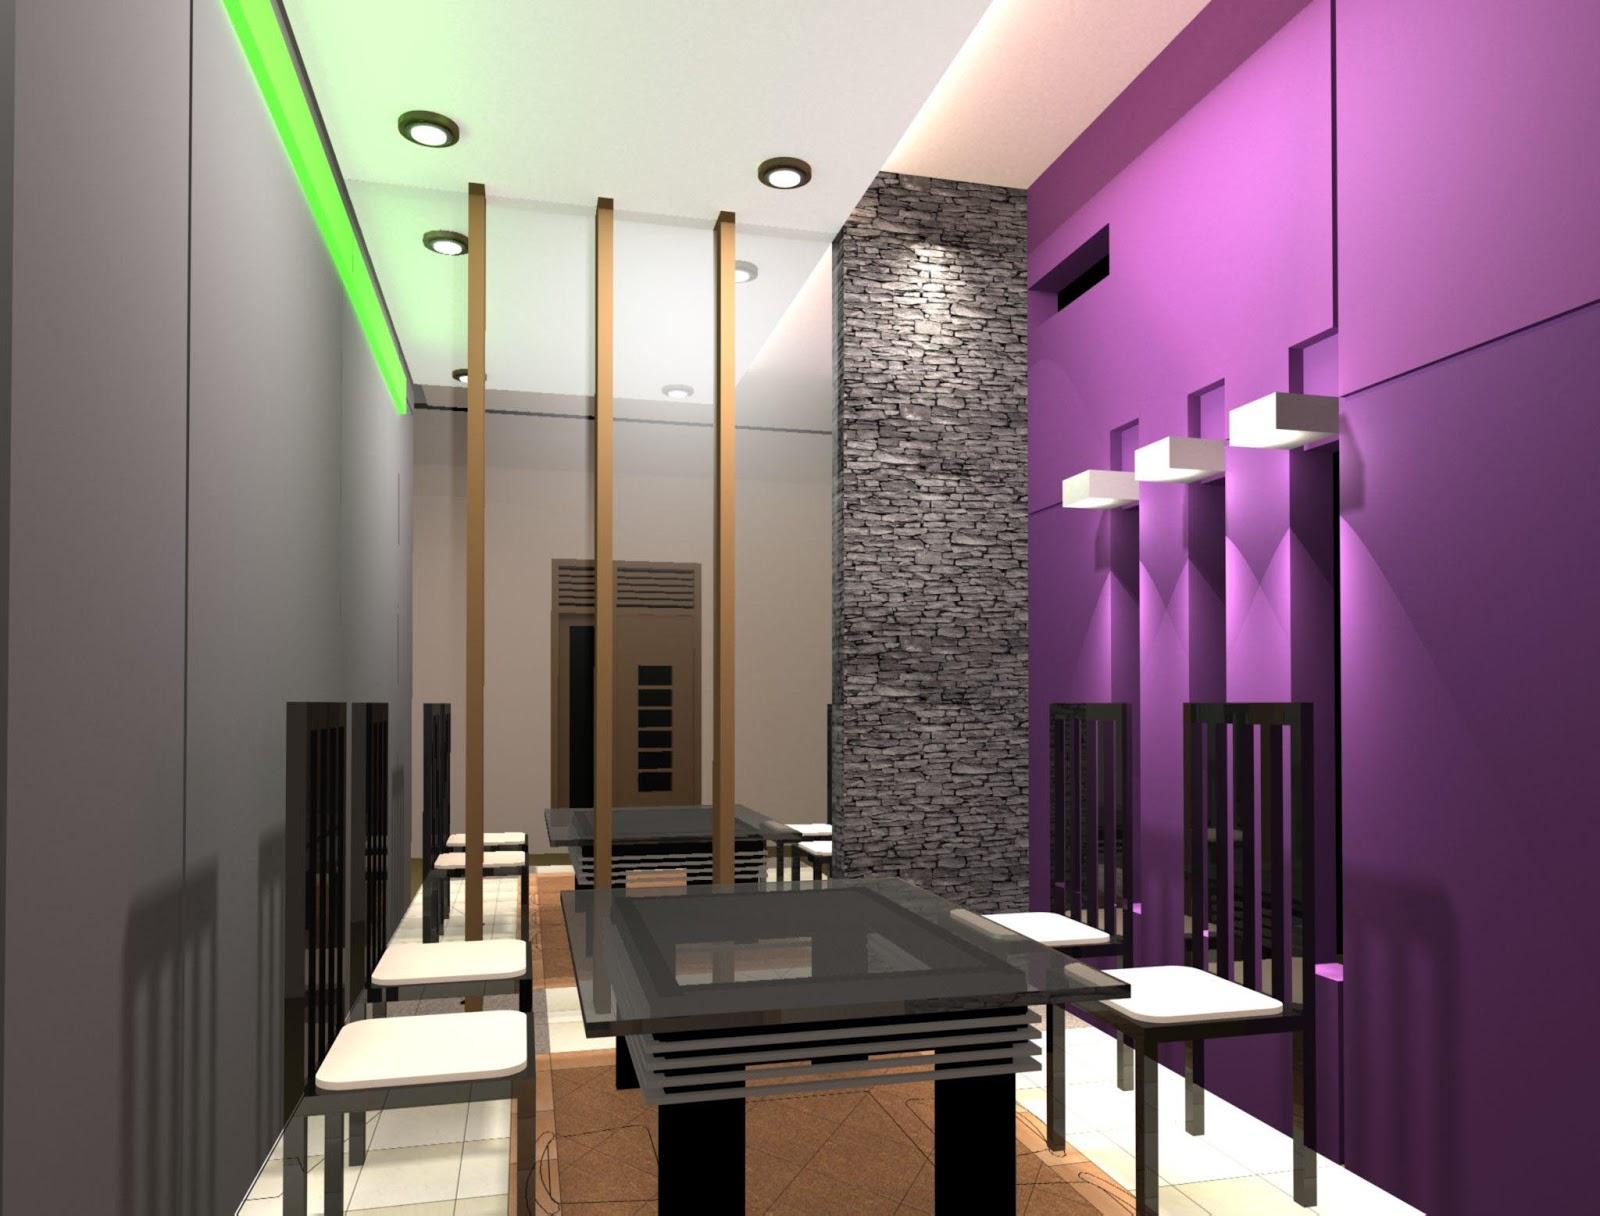 Ruang Makan Gambar  Dapur Minimalis  Ruang Sempit Denah